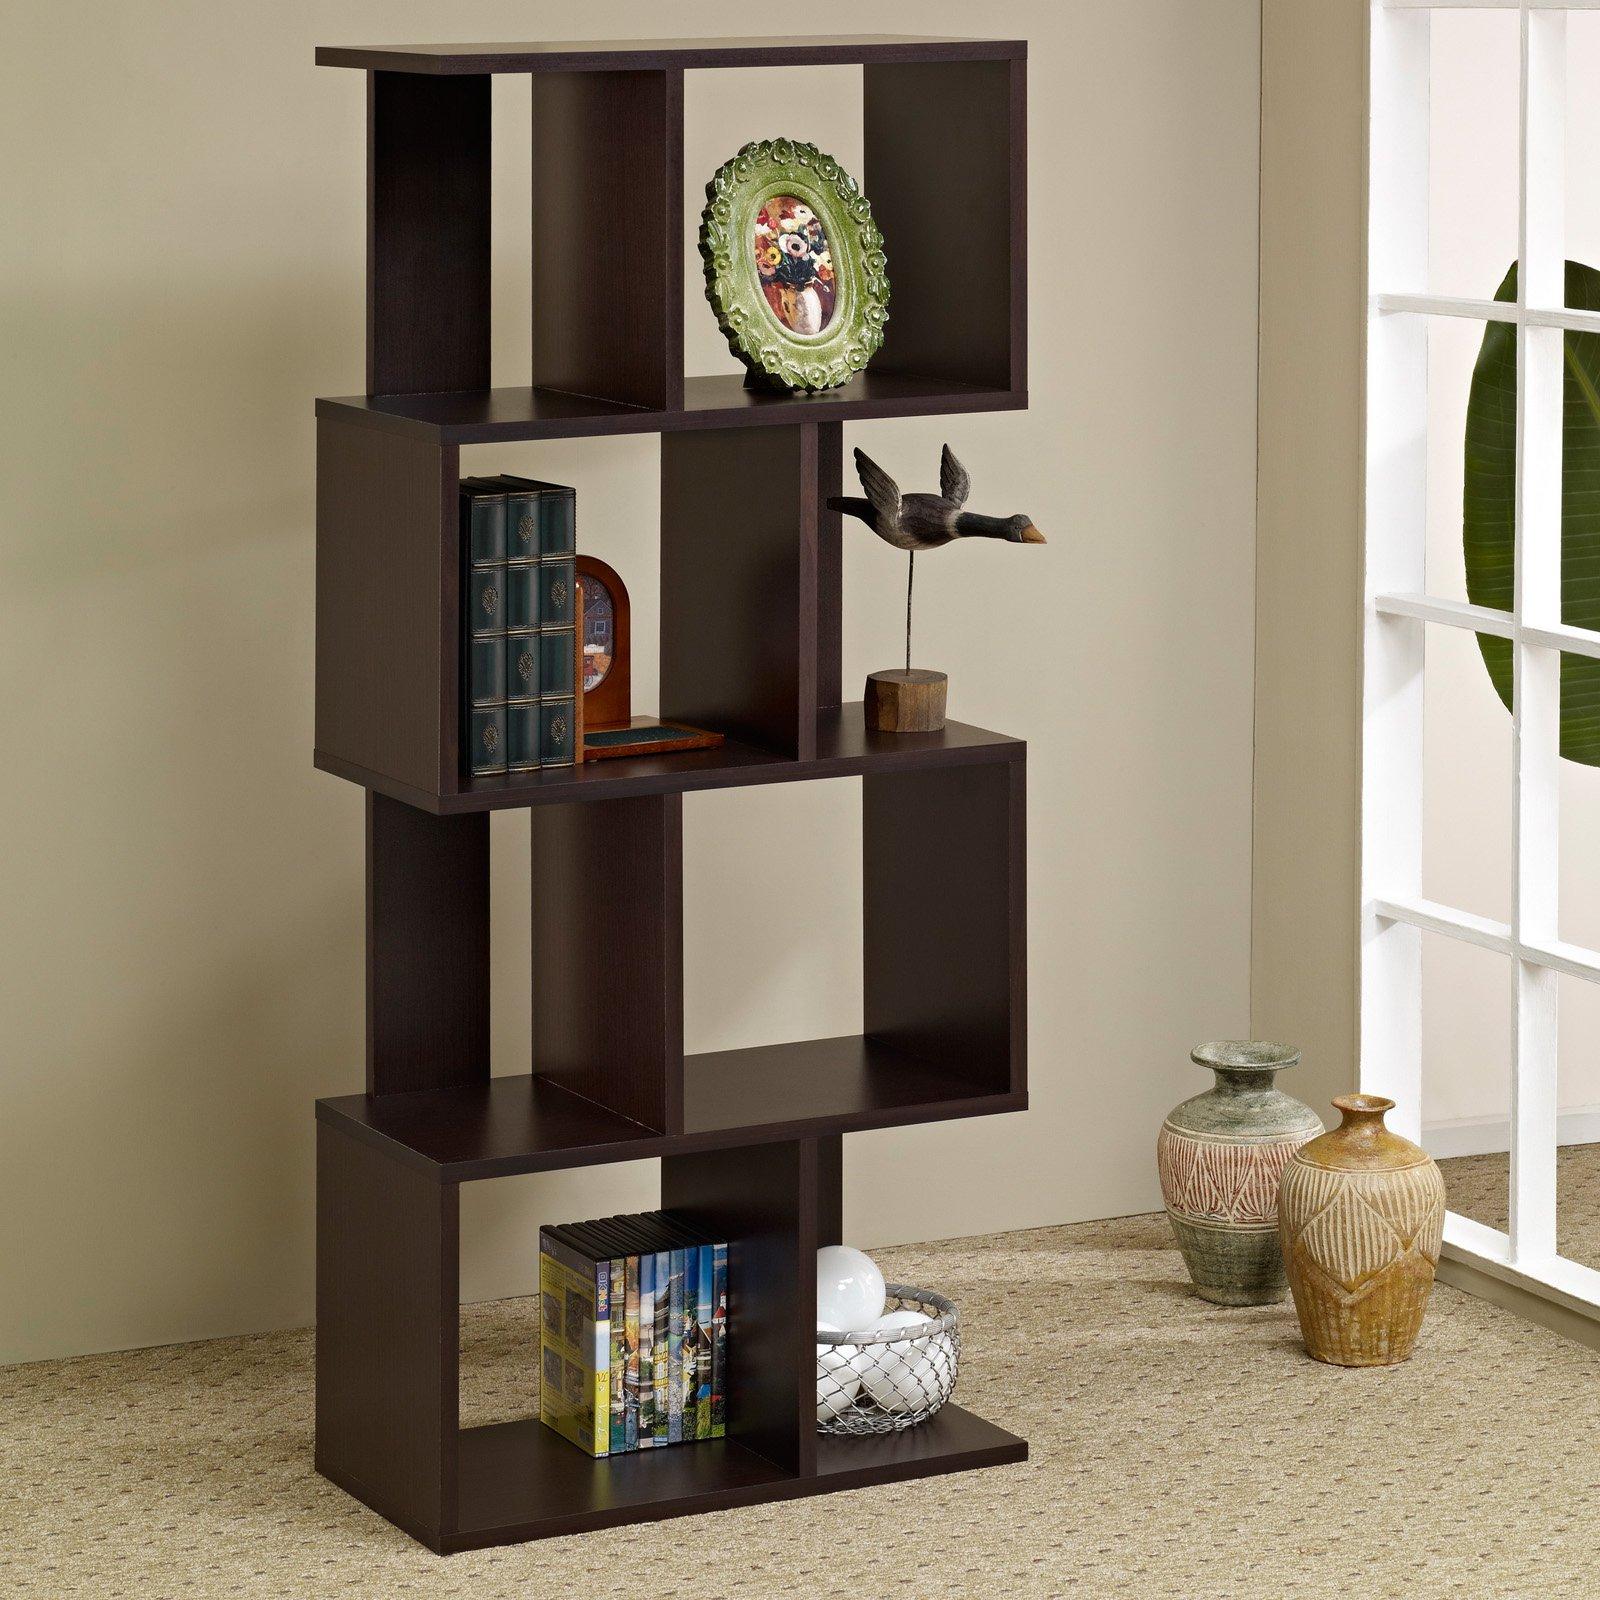 wall divider bookshelf photo - 9